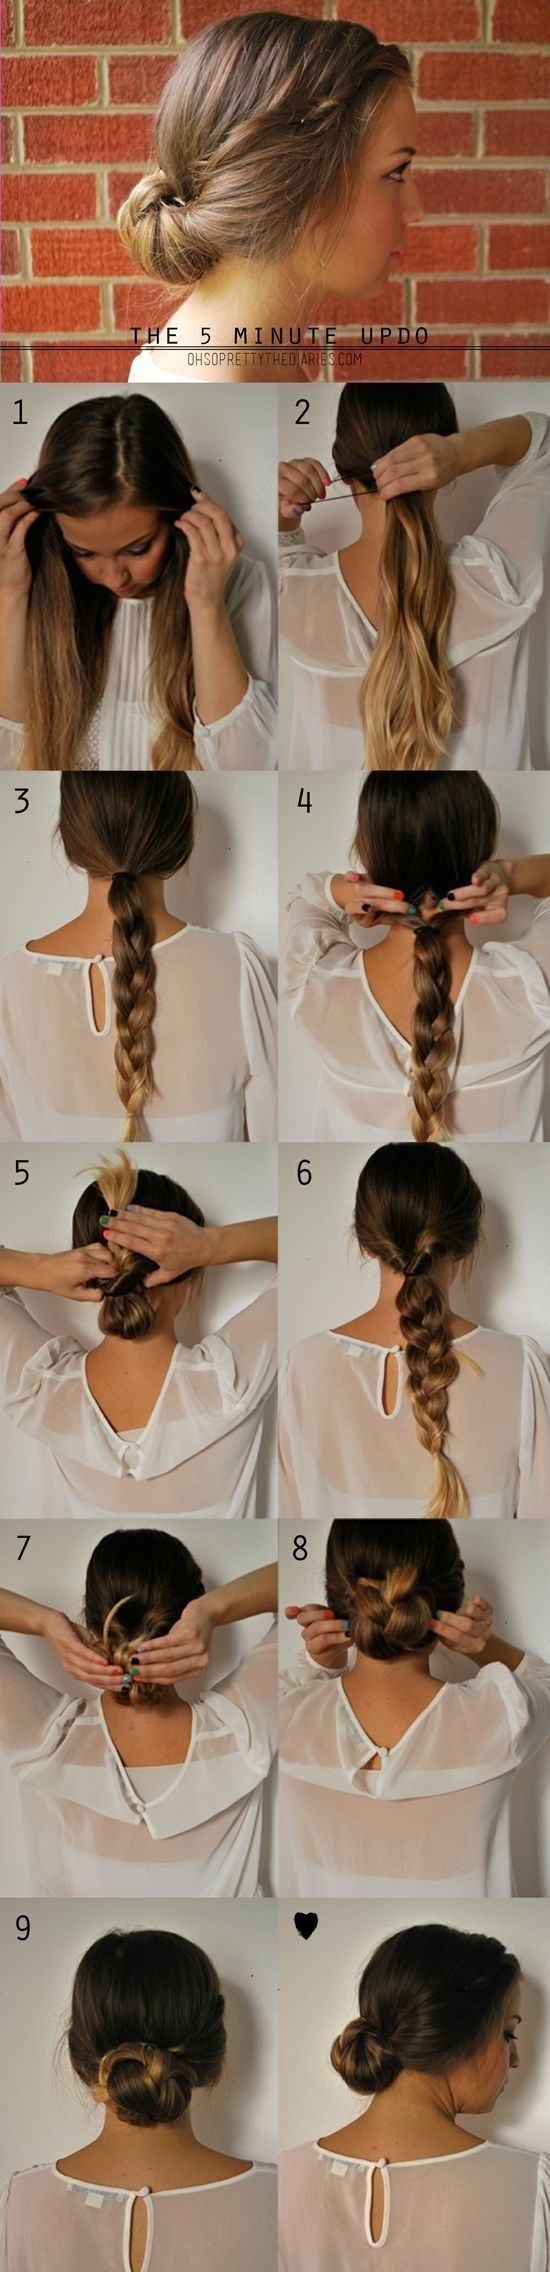 Super Cute HEATLESS Hairstyles! #Fashion #Beauty #Trusper #Tip